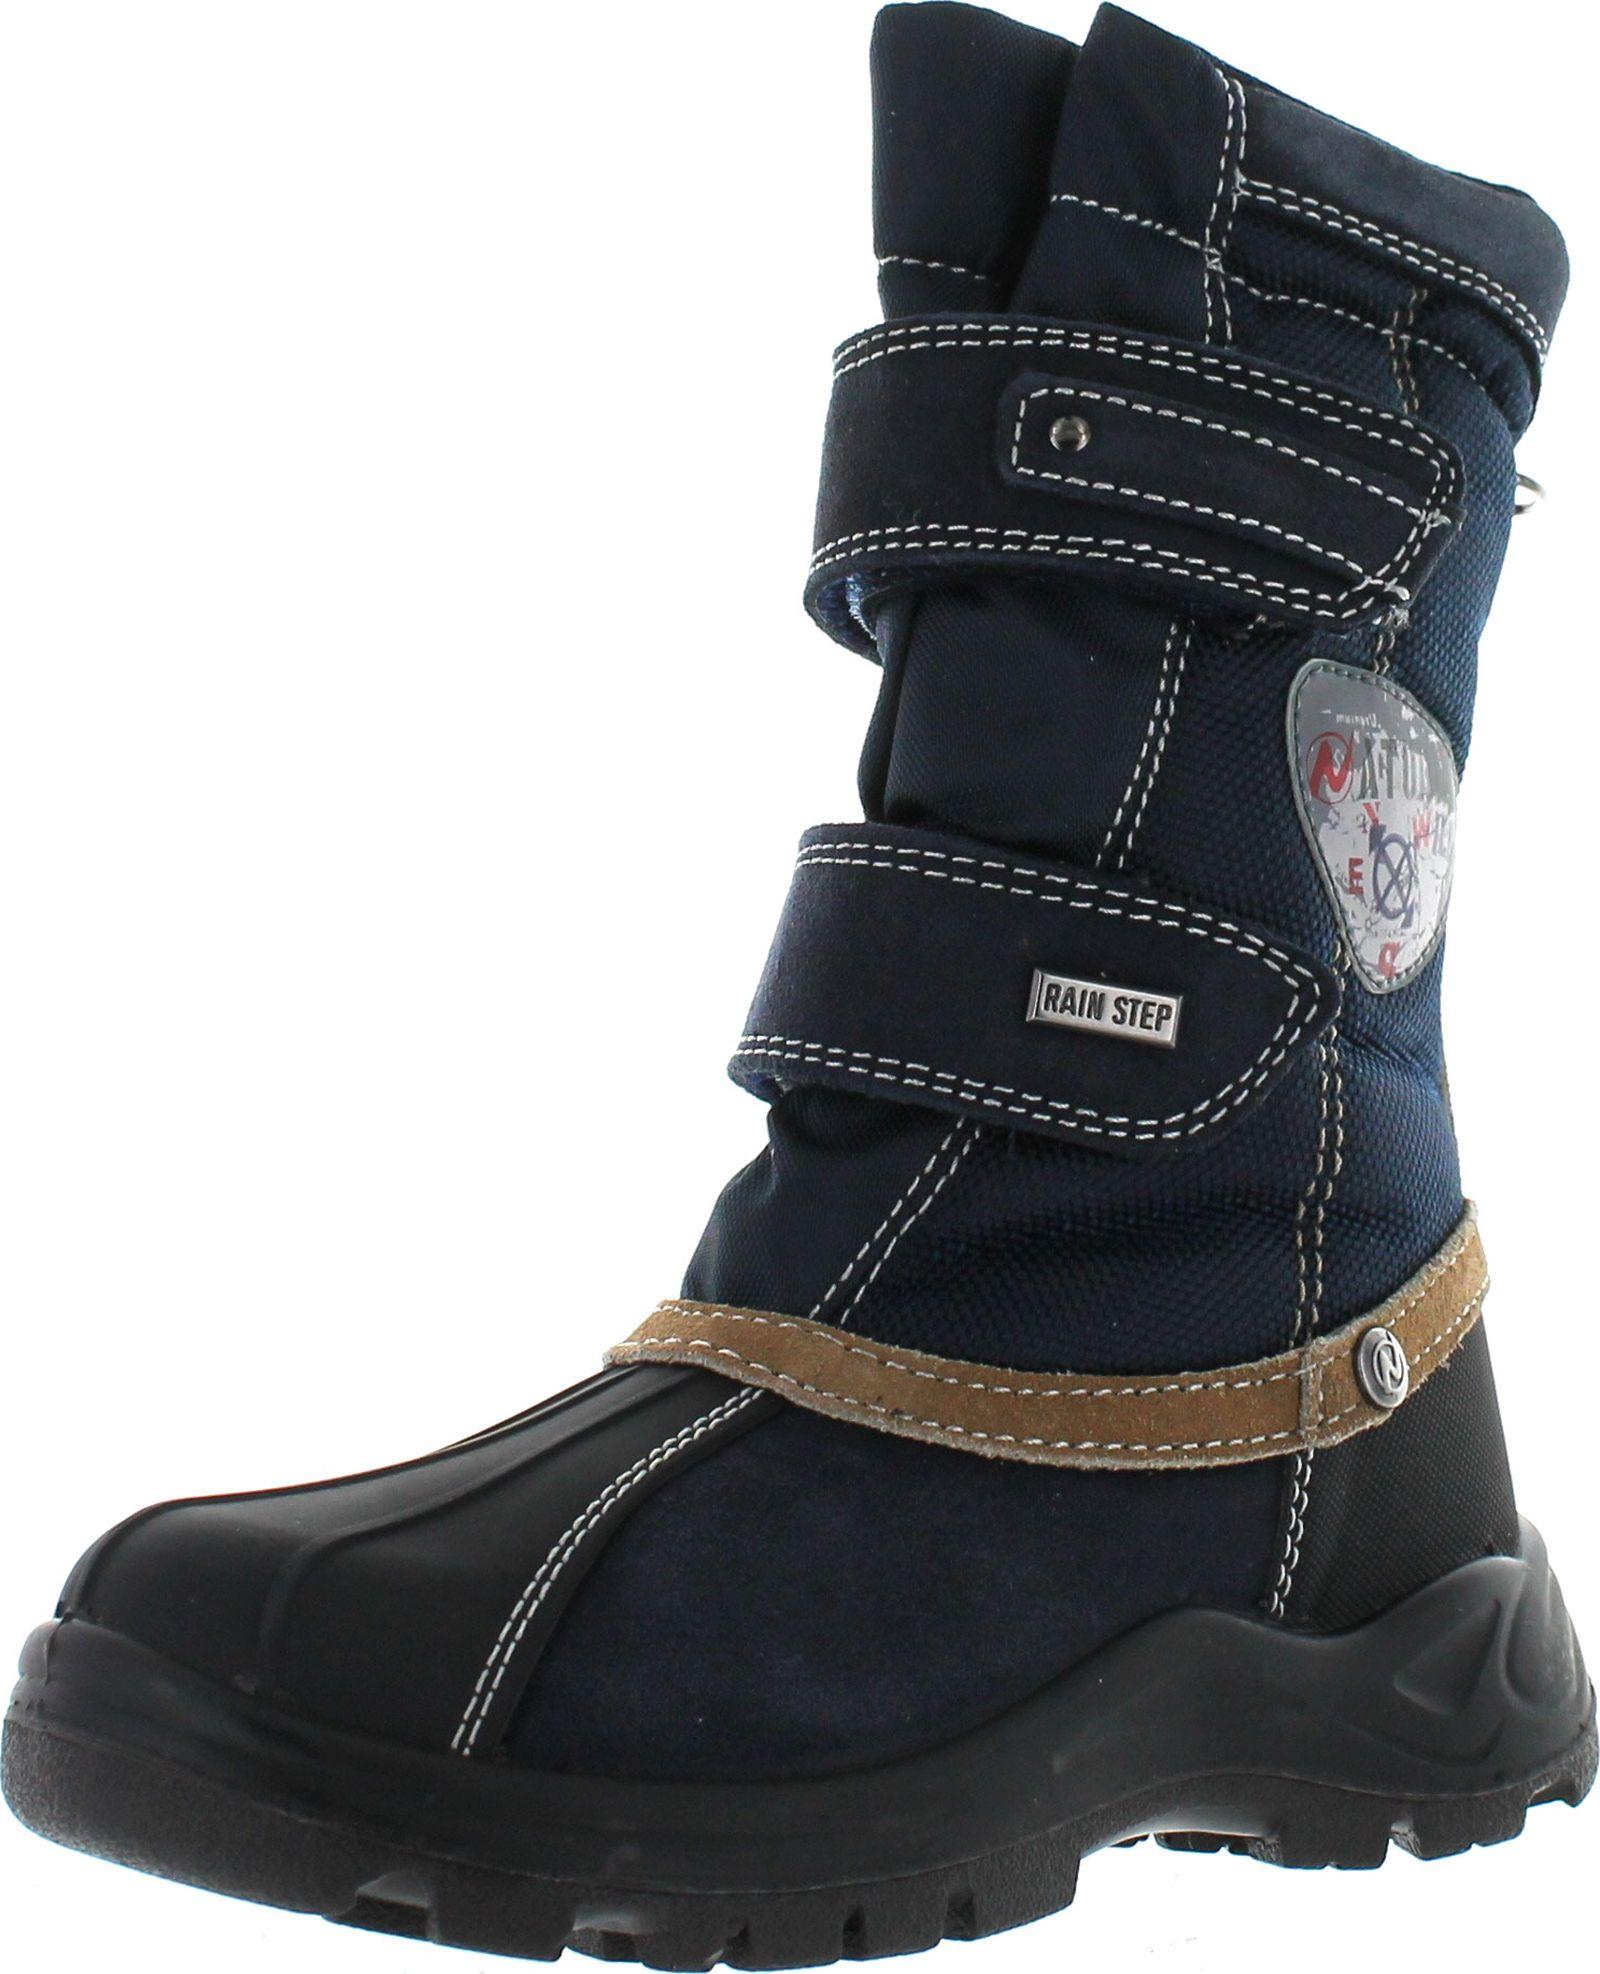 Naturino Kids Shoes